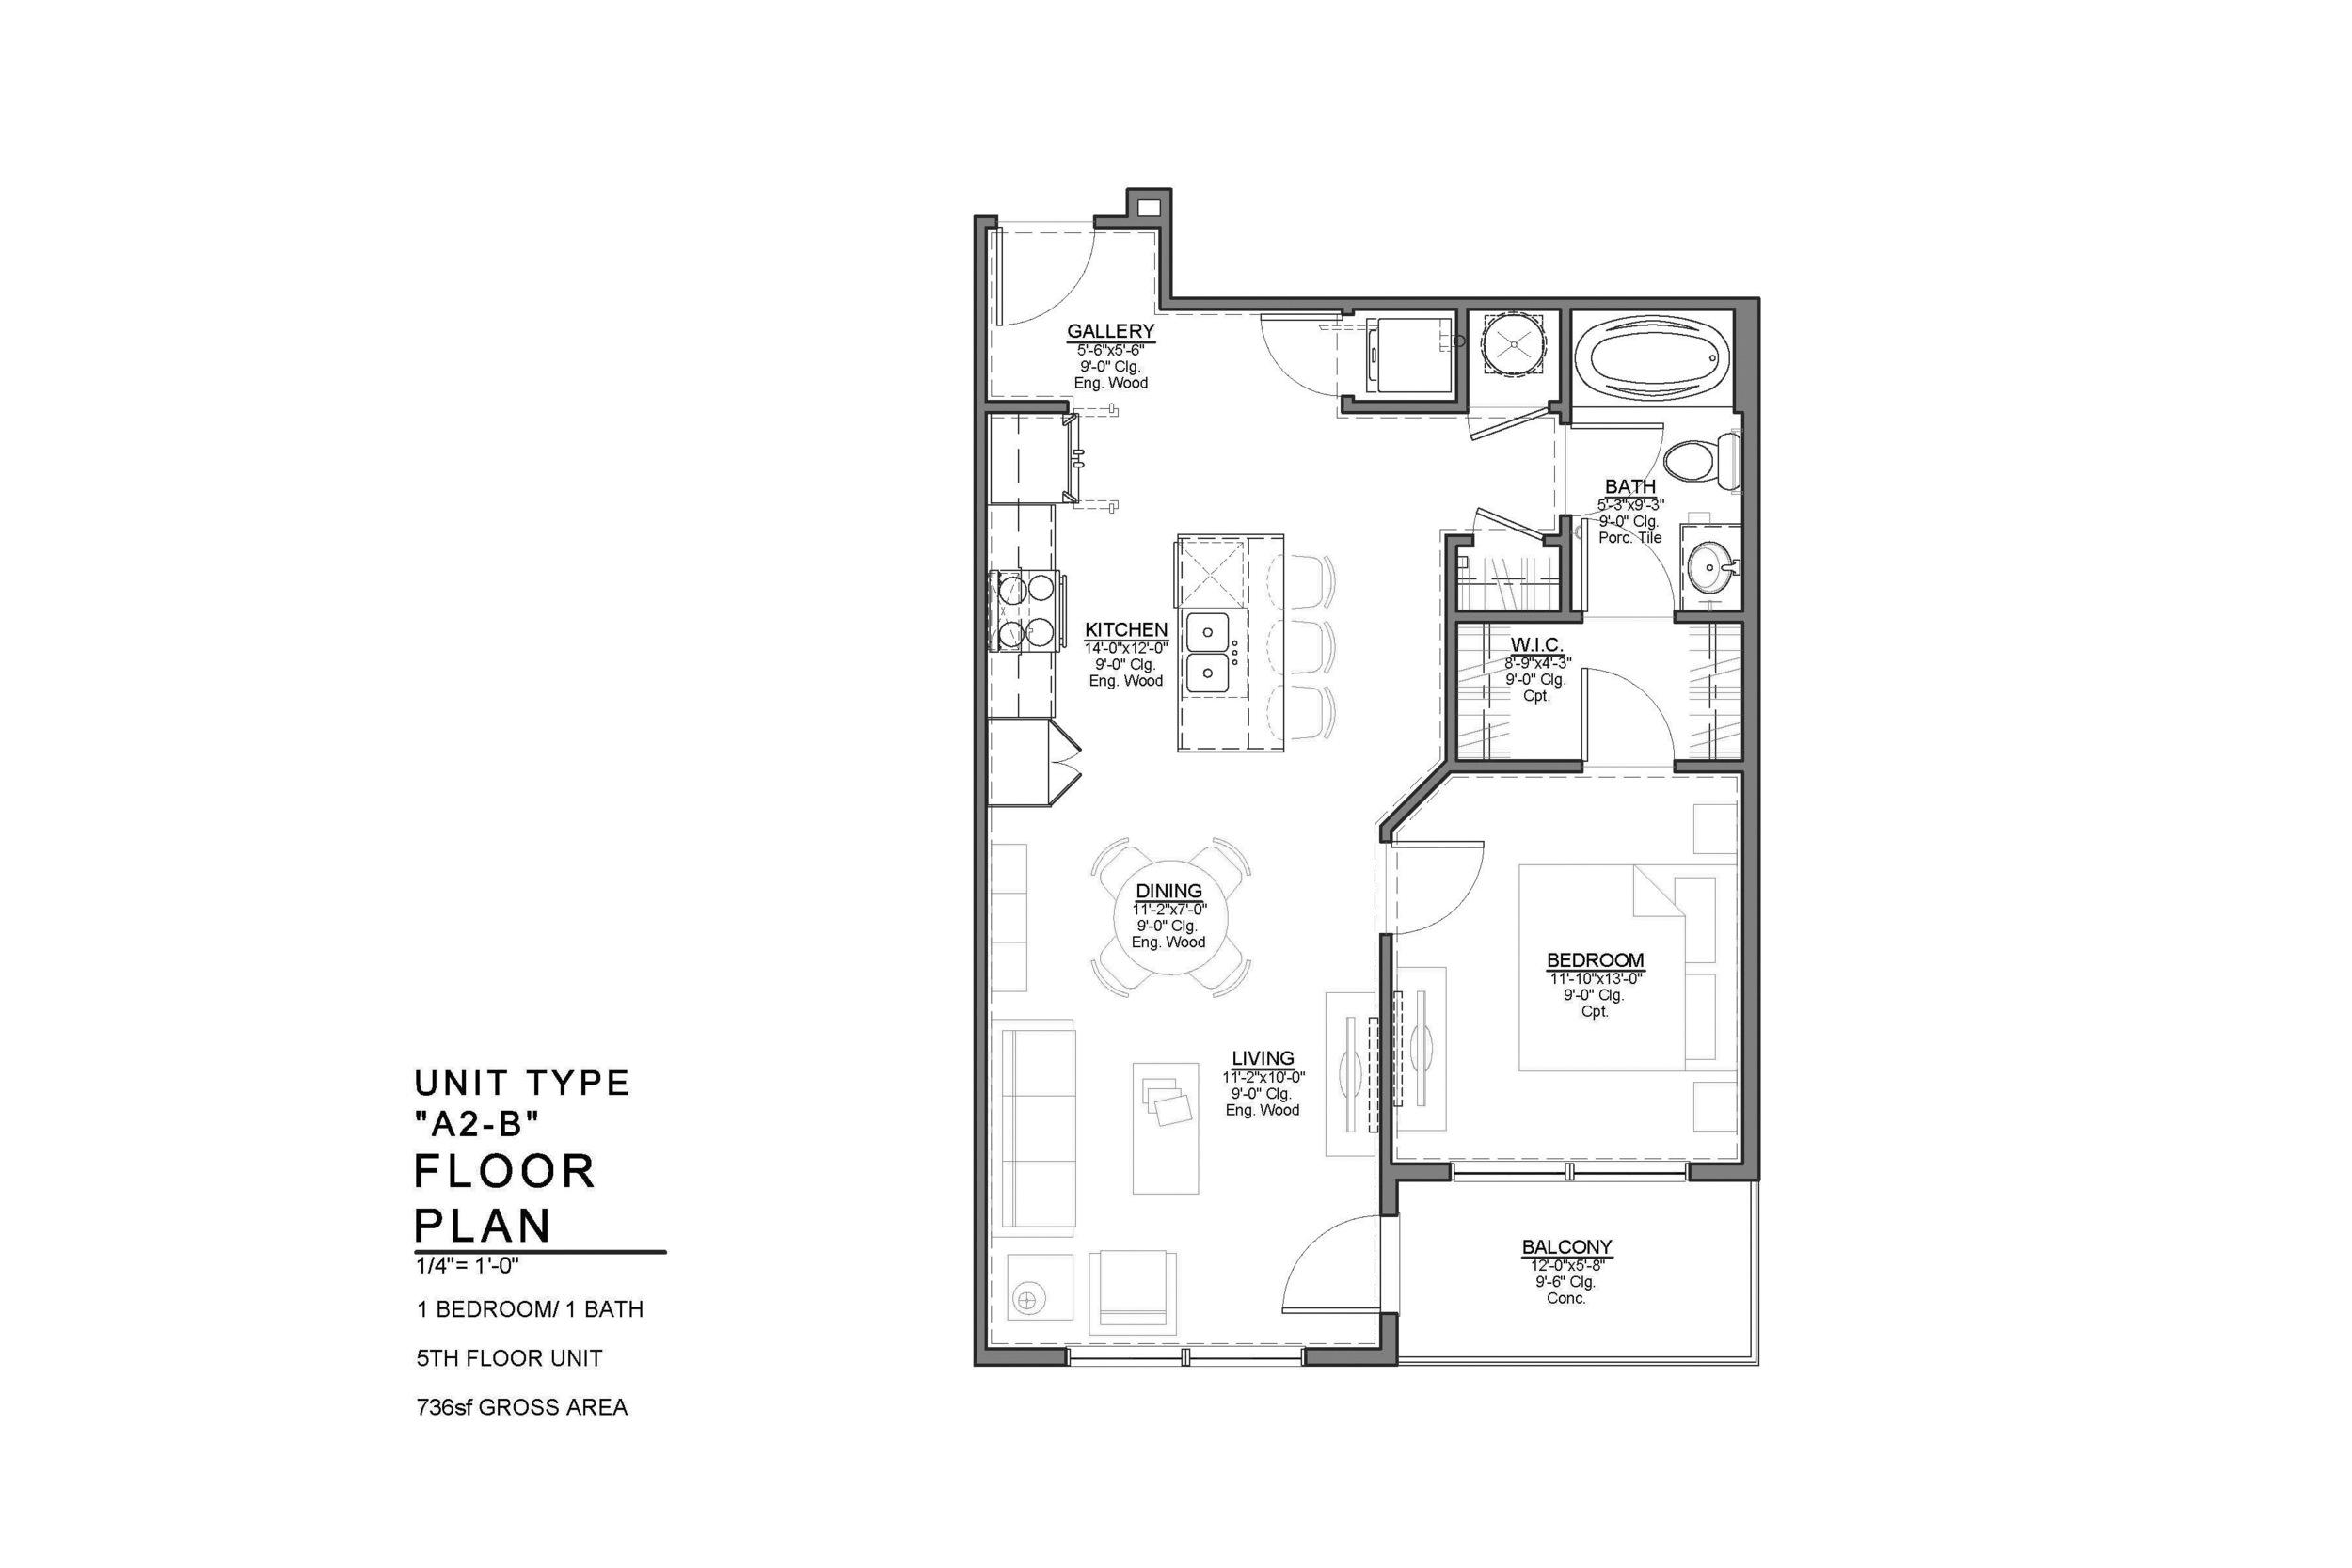 A2-B FLOOR PLAN: 1 BEDROOM / 1 BATH